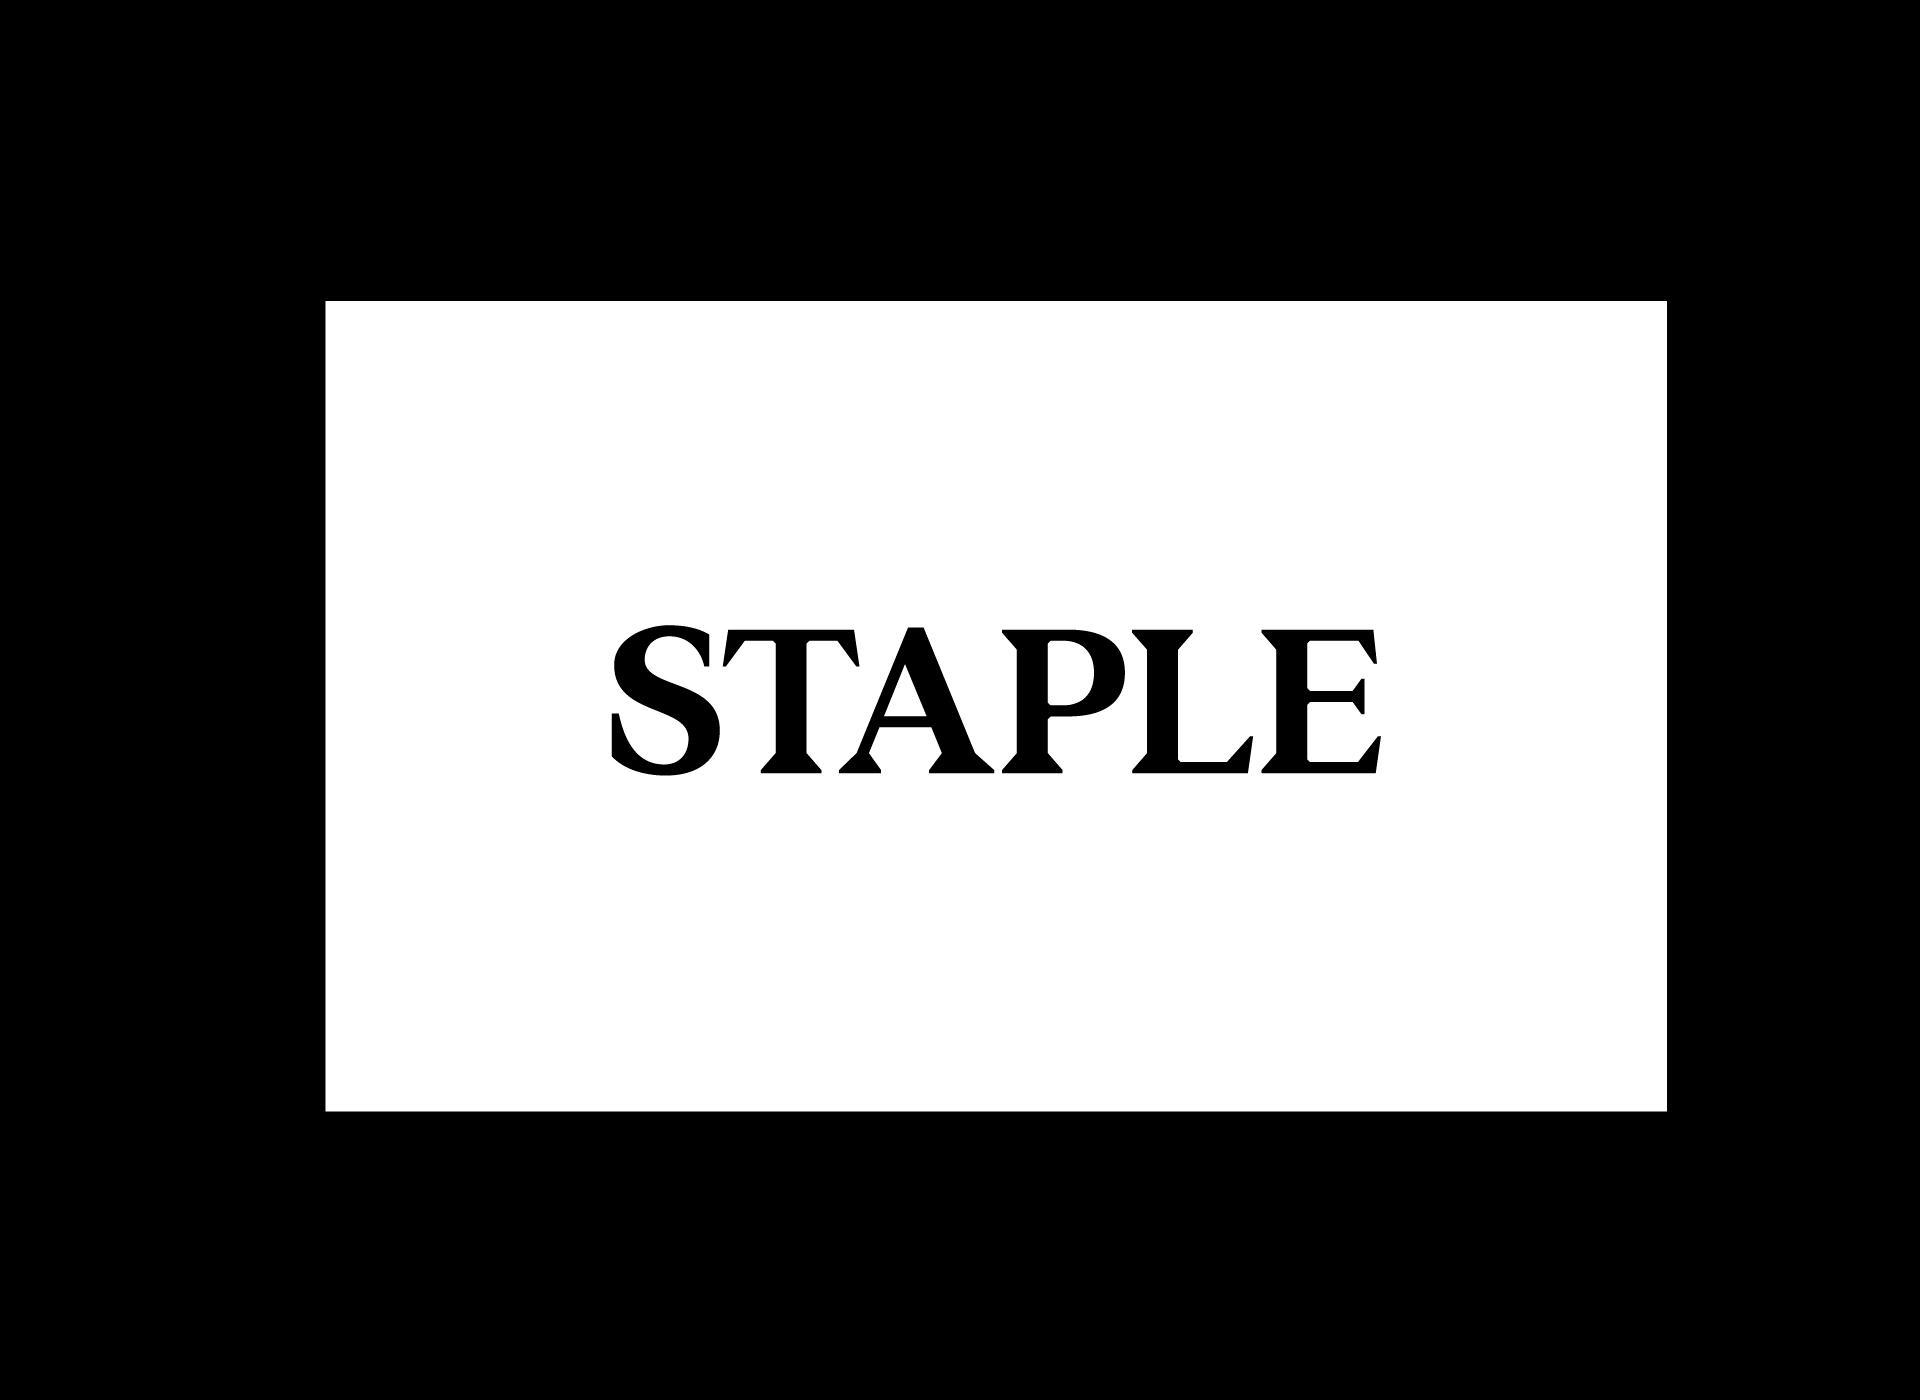 LBstaple01